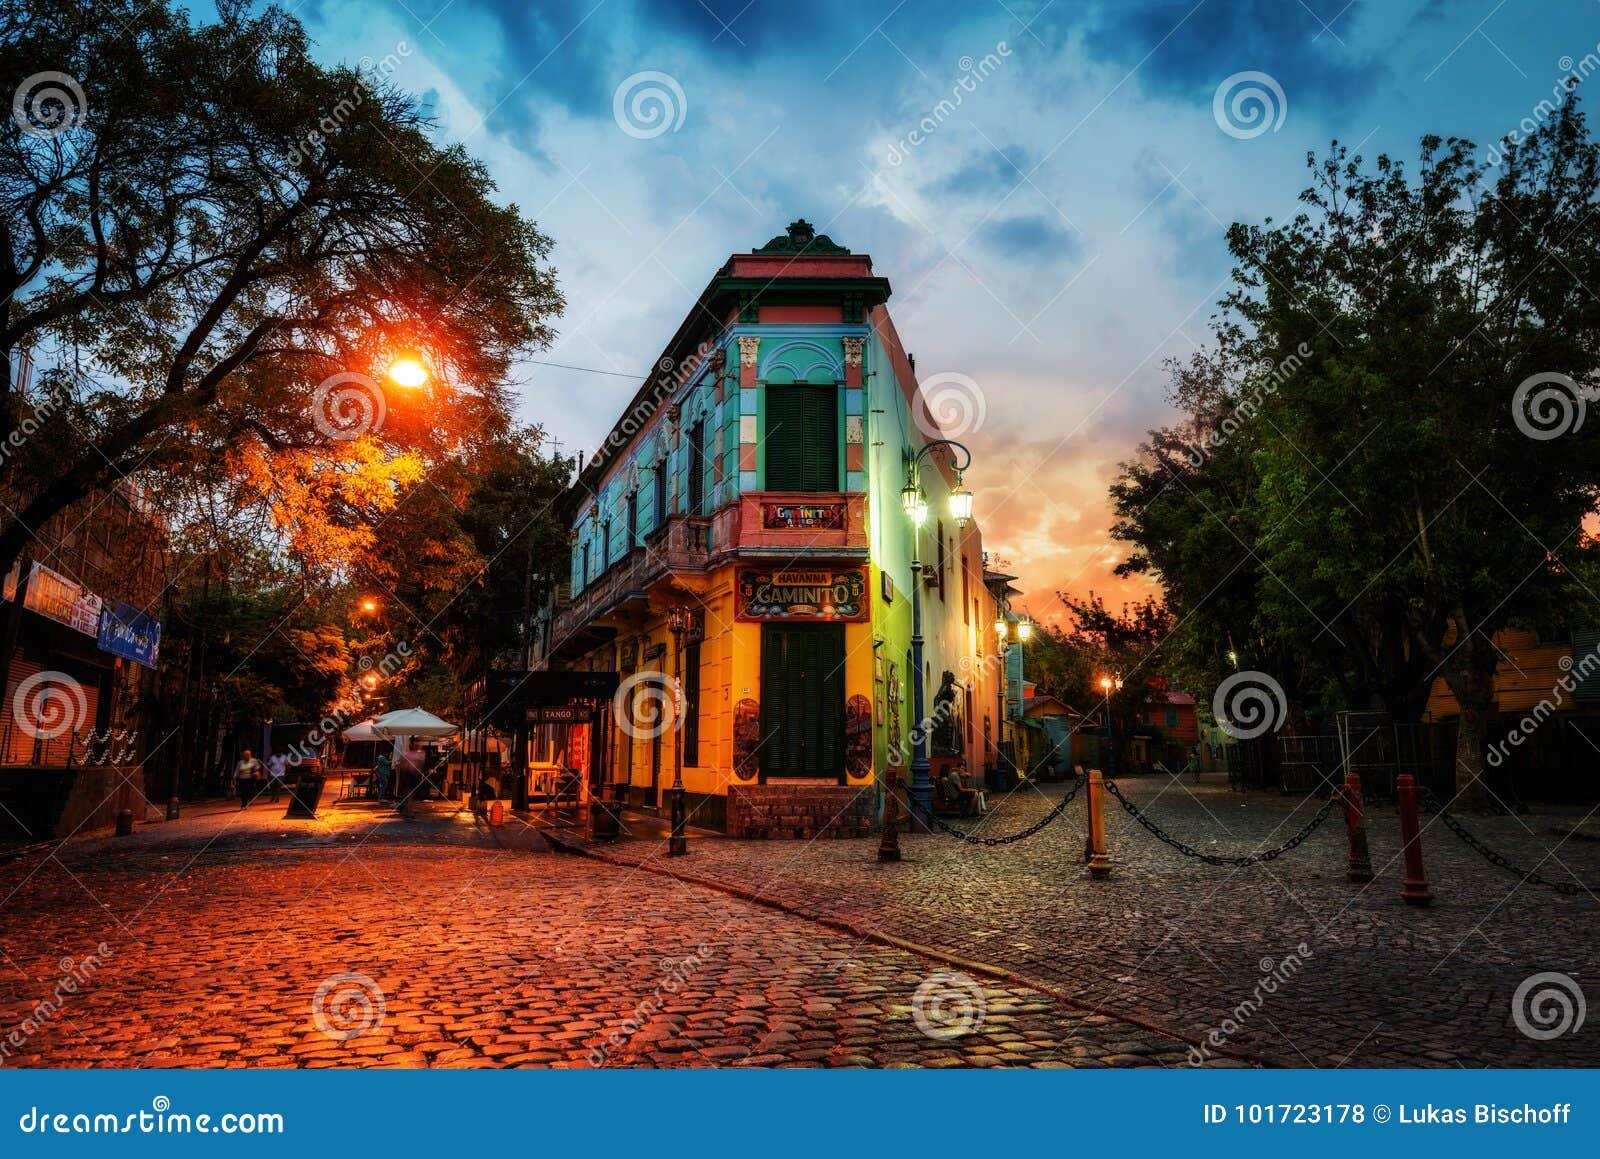 Piazza pubblica in La Boca, Buenos Aires, Argentina Preso durante